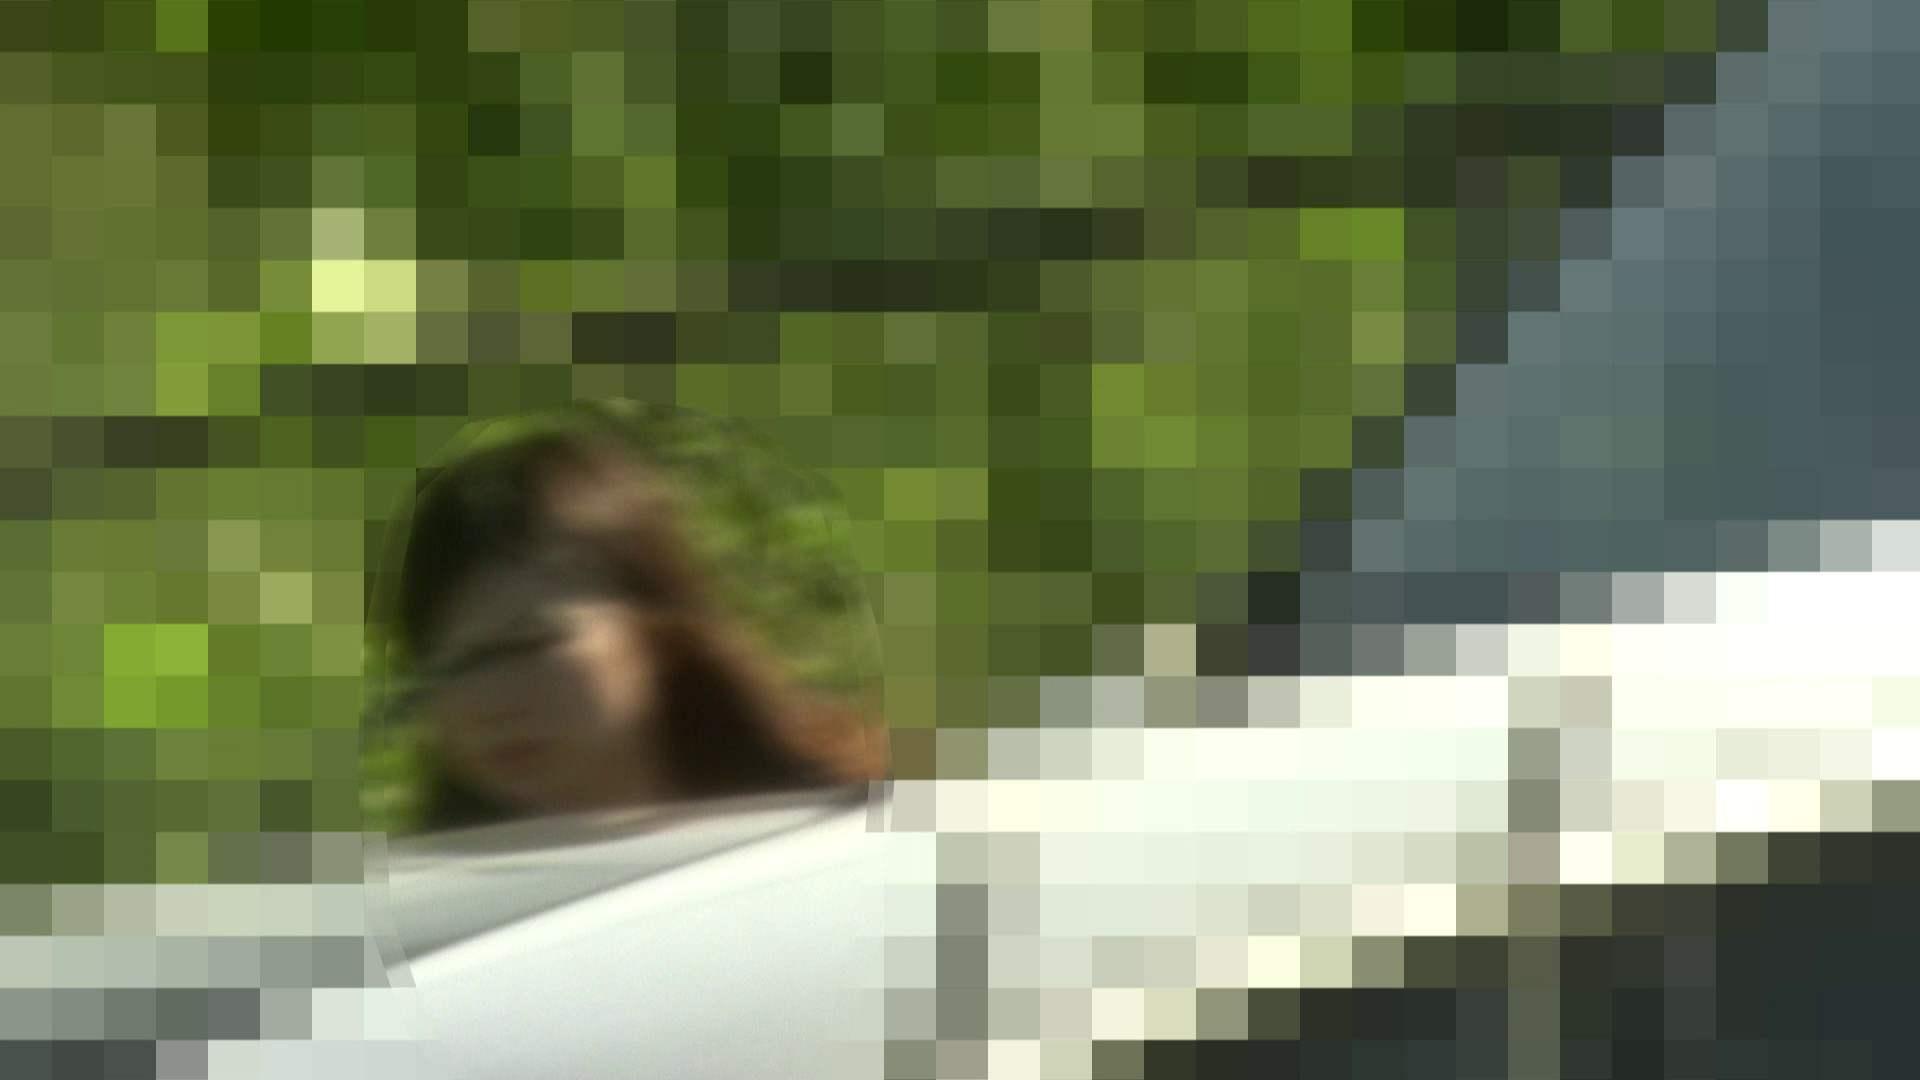 Aquaな露天風呂Vol.183 盗撮師作品 エロ無料画像 105pic 2